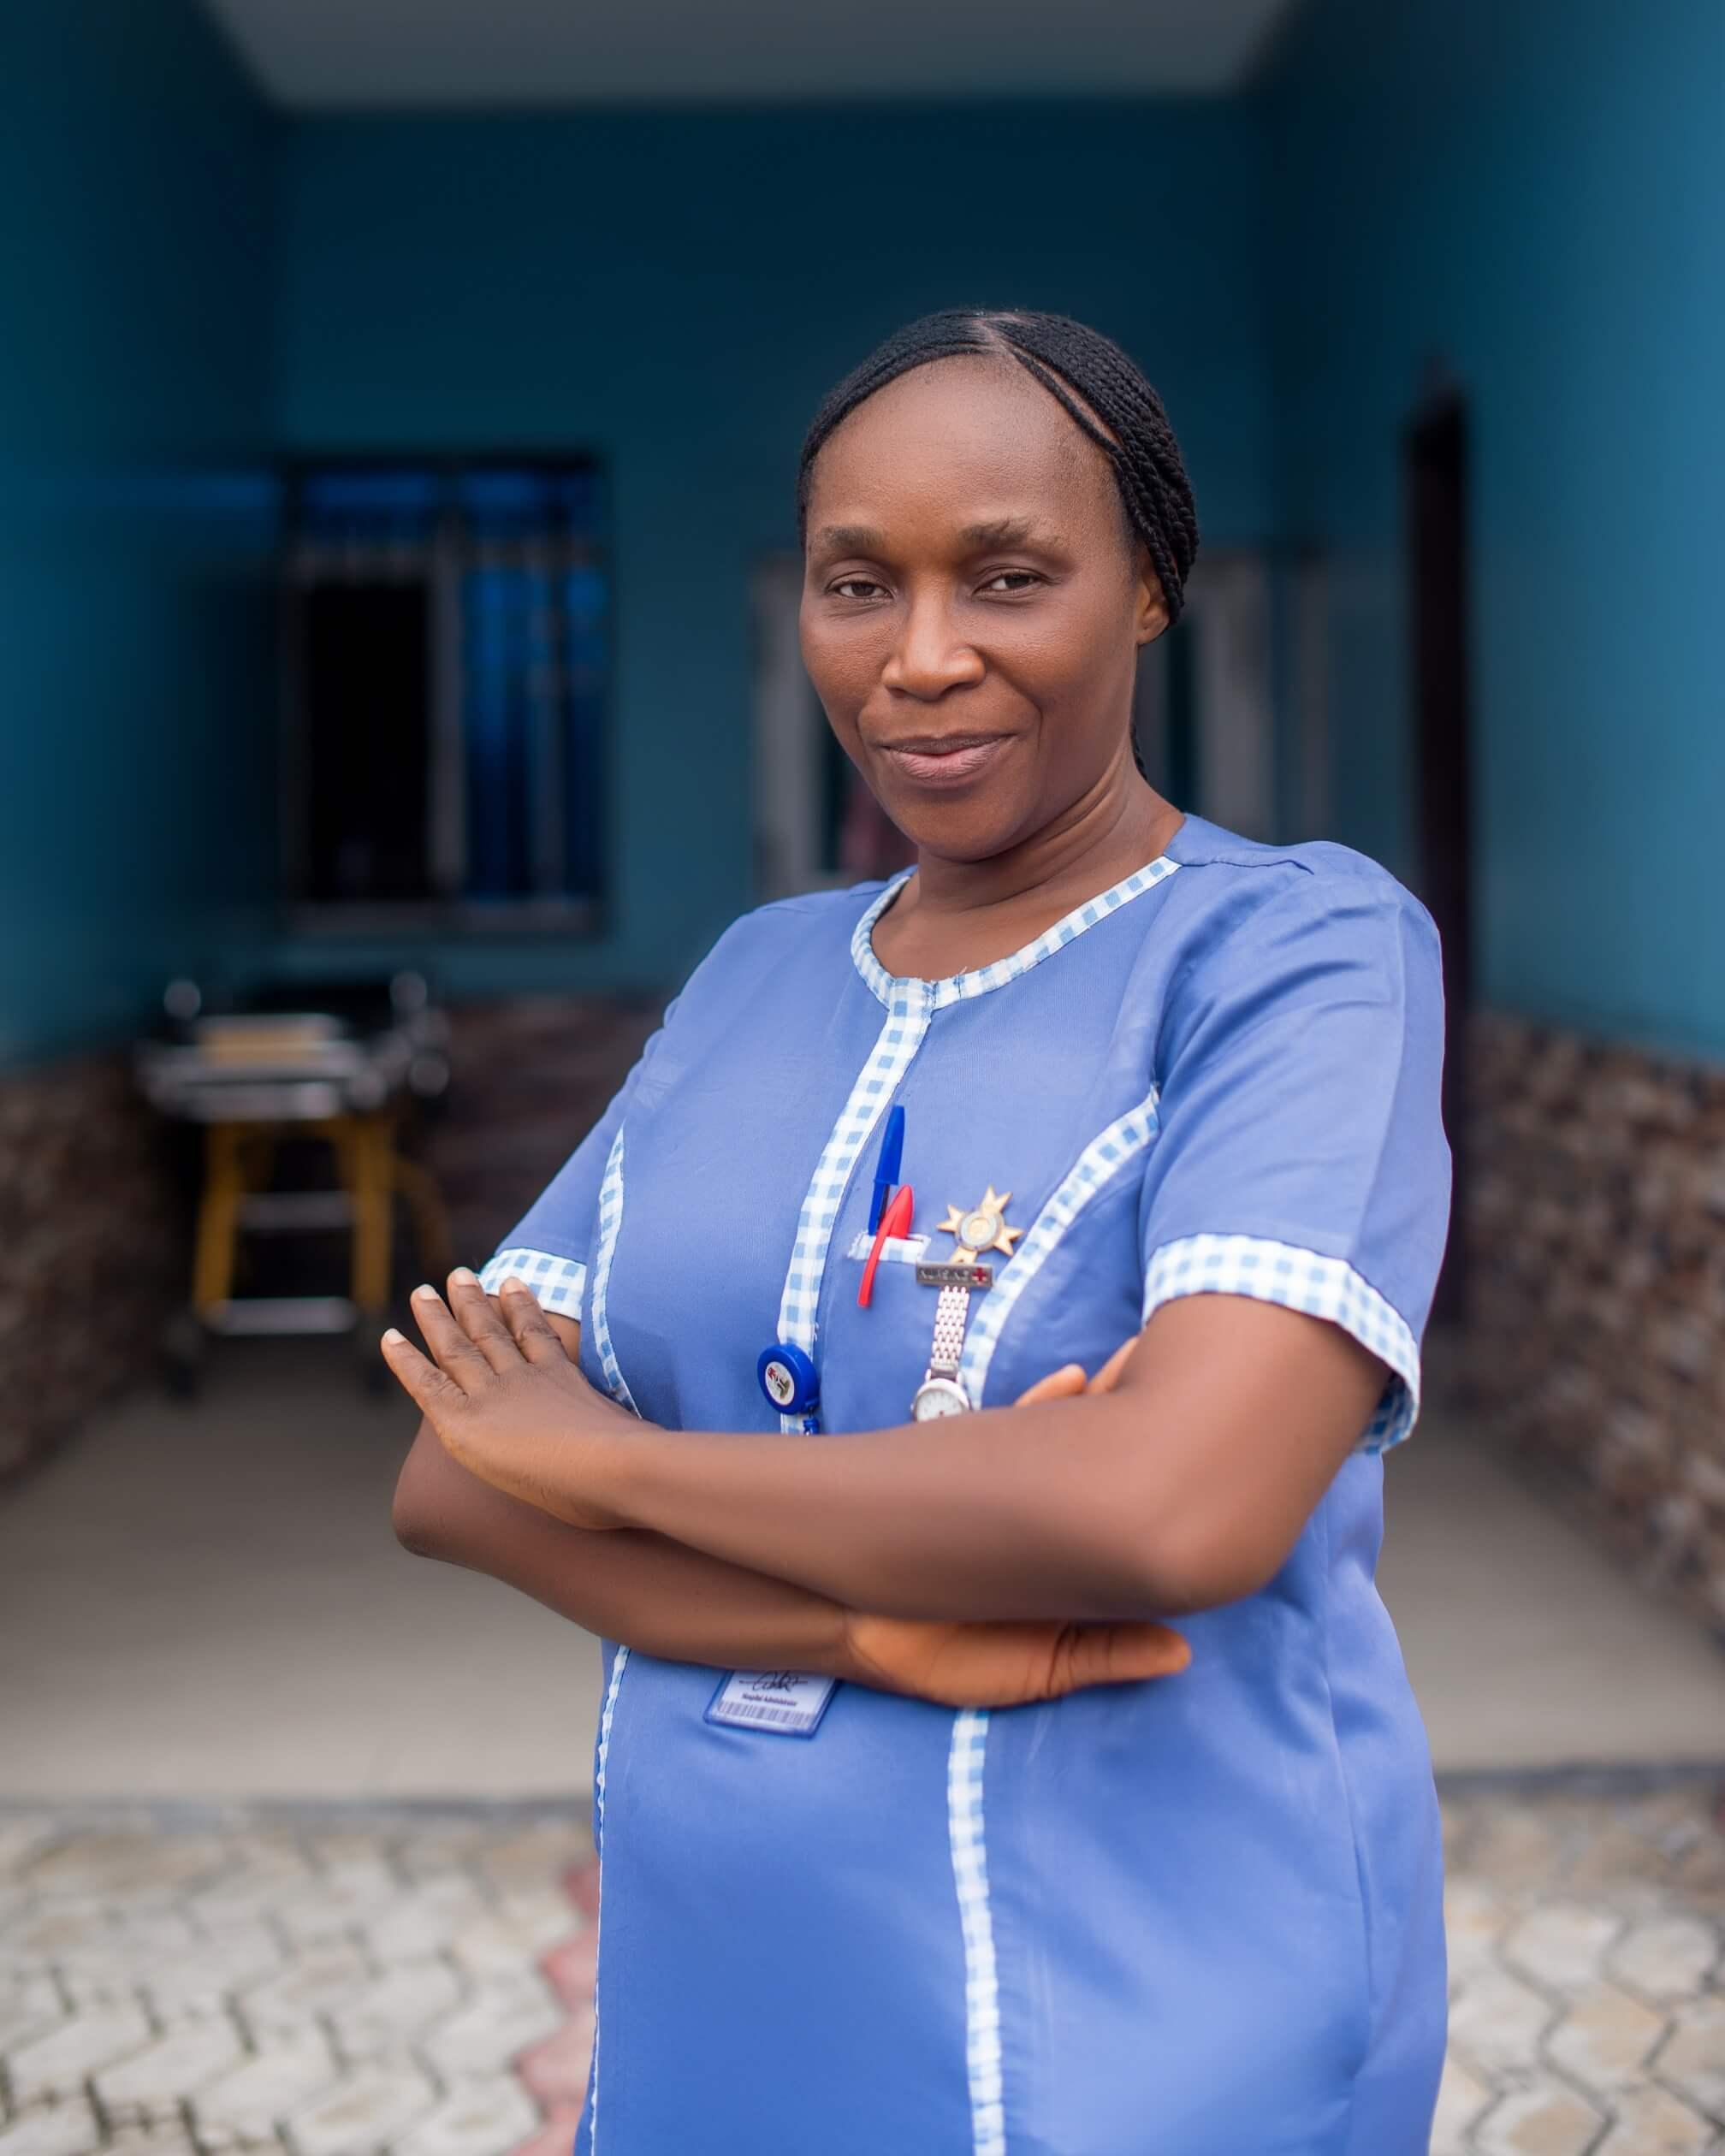 Head Of Station 2 at Shammah Christian in Hospital Port Harcourt